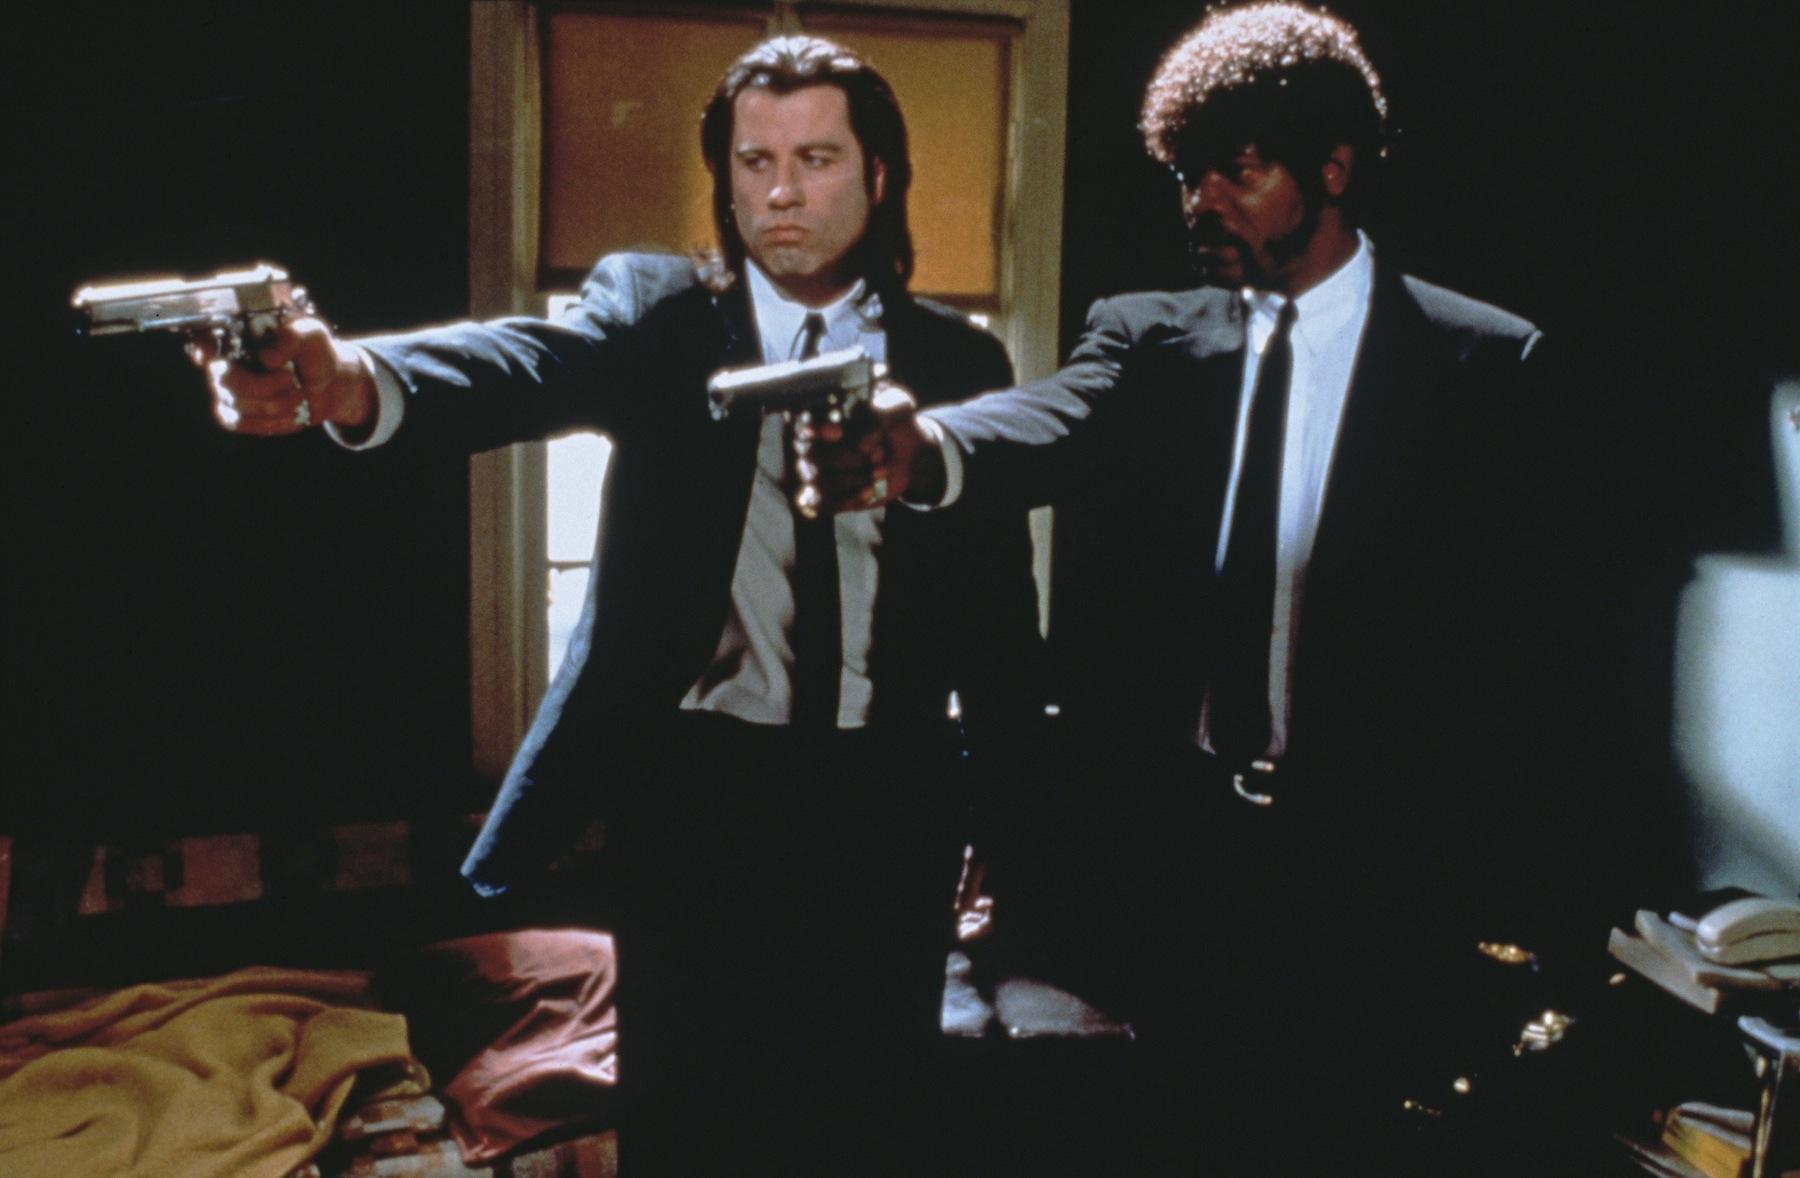 Pulp Fiction Movie Scene